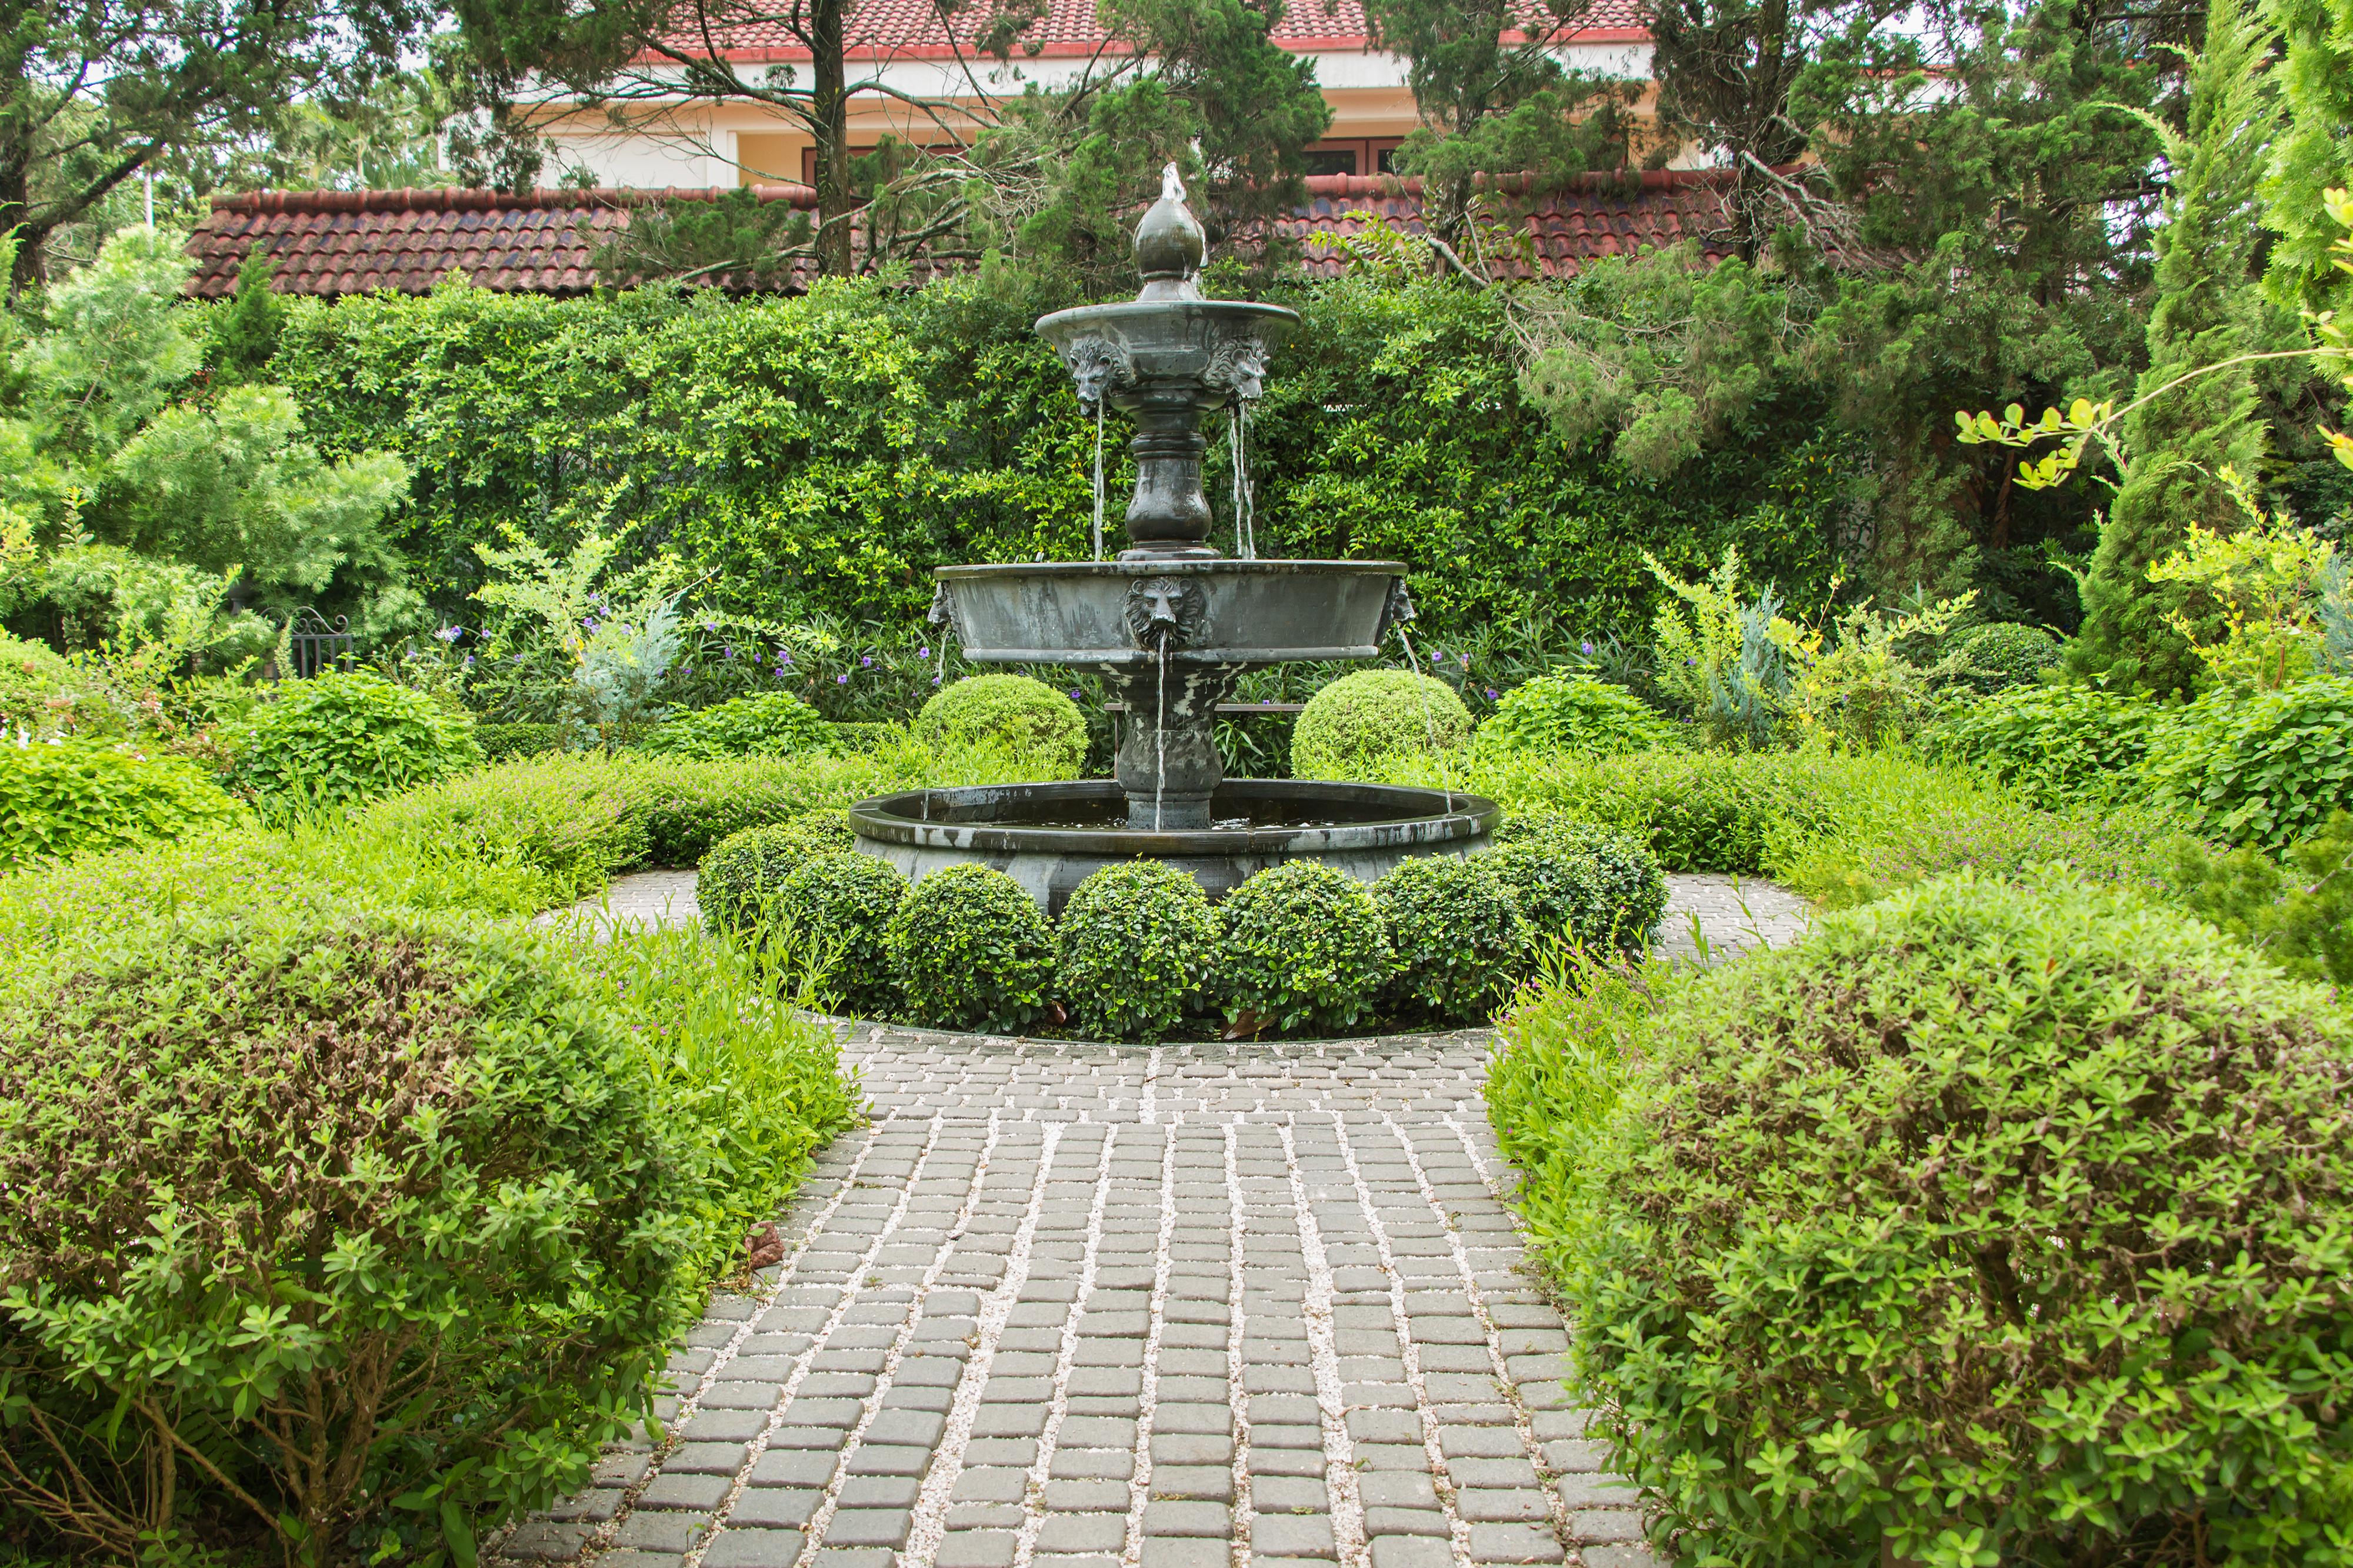 comment amnager son jardin montauban - Comment Amenager Son Jardin